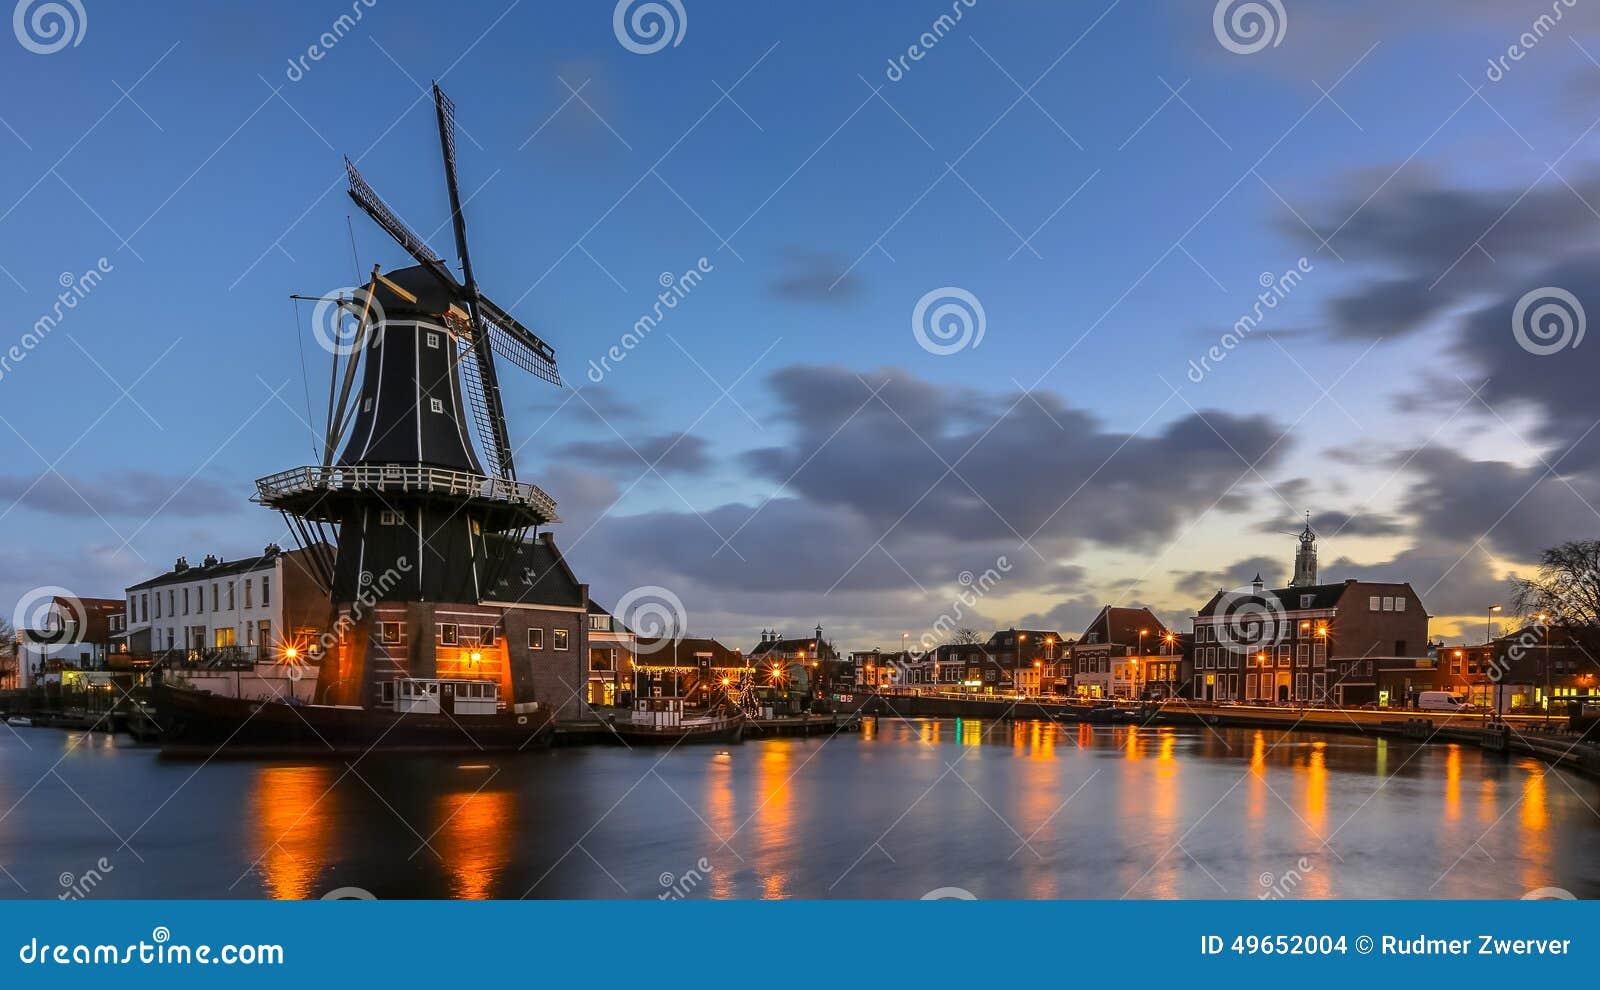 Manila To Netherlands Travel Time